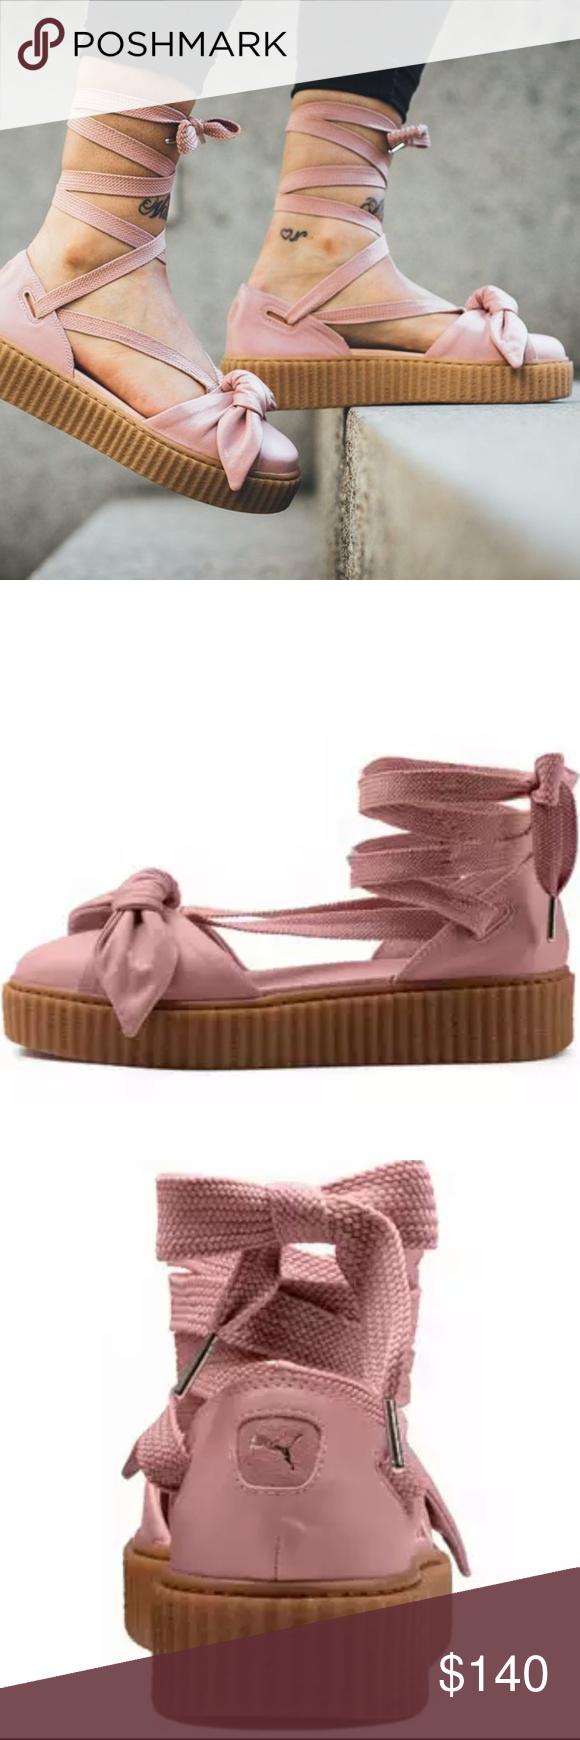 PUMA FENTY PUMA by Rihanna Bow Creeper Lace-Up Sandal Pick A Size MSRP $140